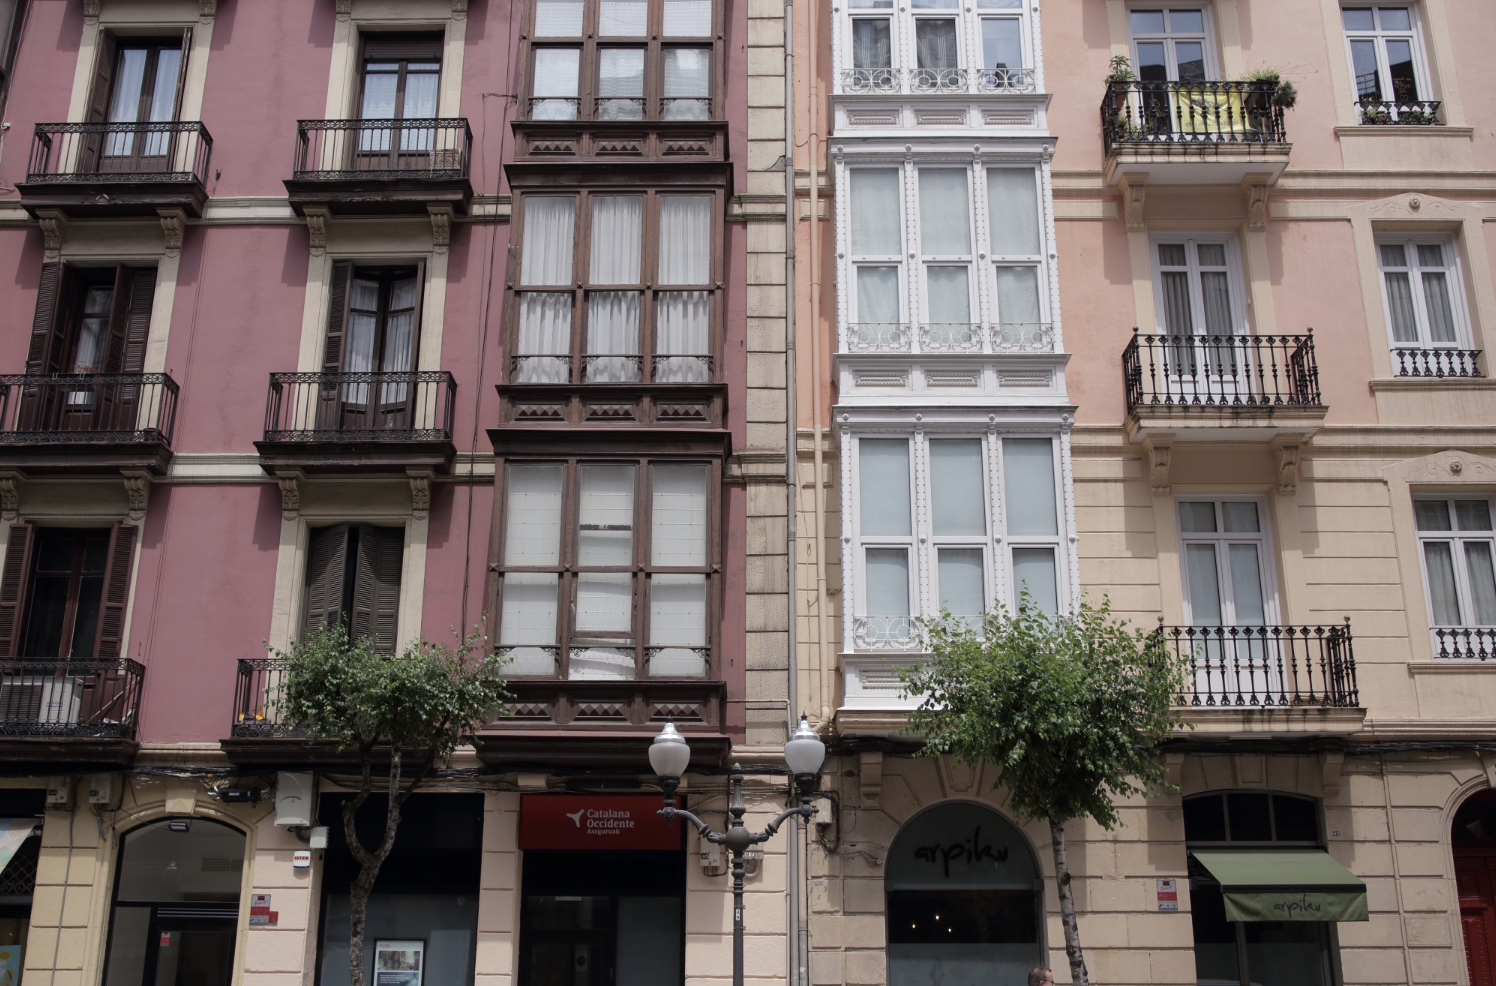 Eleganza Bilbao, ManueleGeromini©️